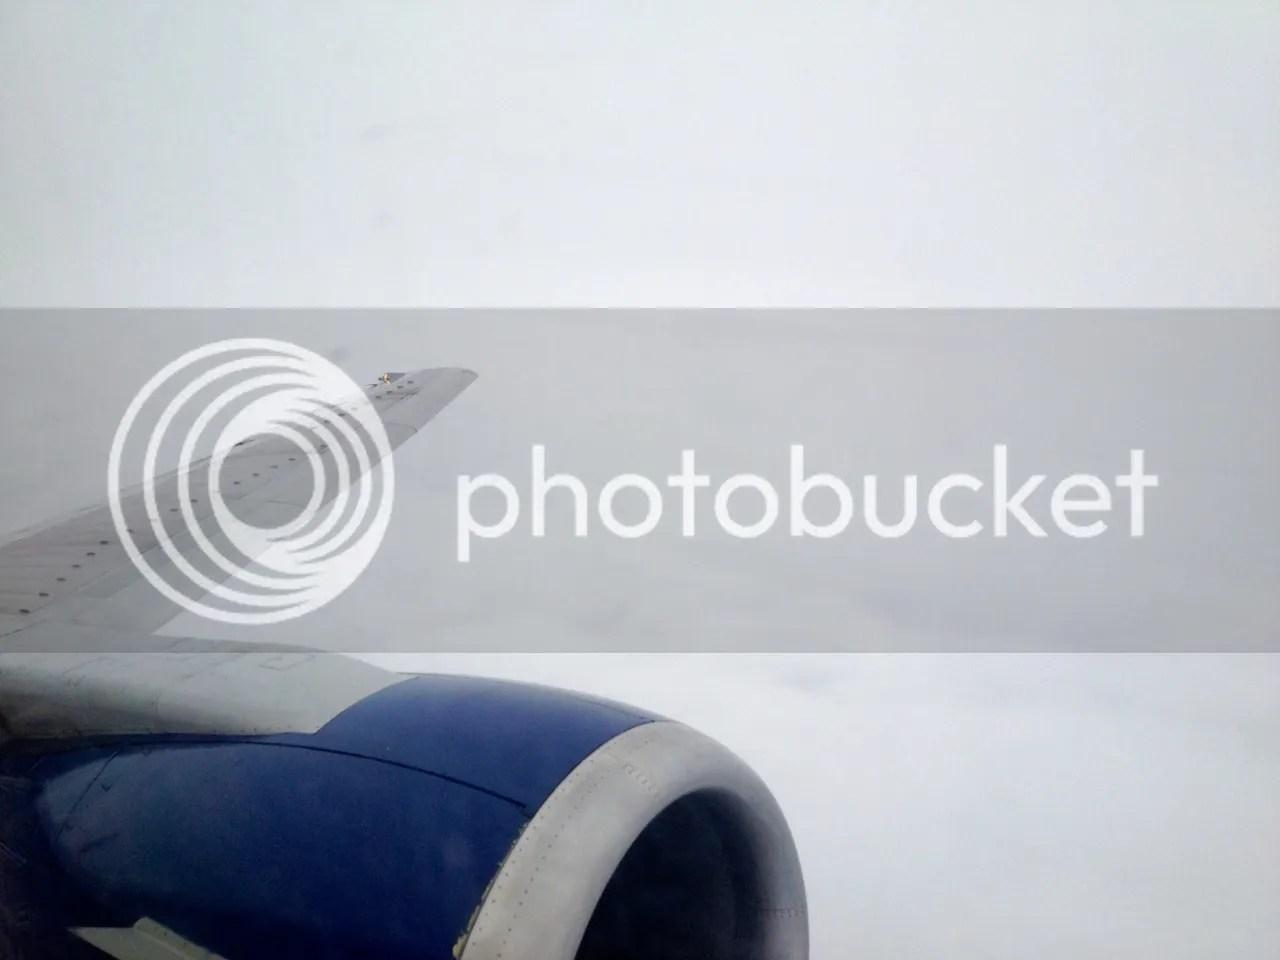 https://i2.wp.com/i181.photobucket.com/albums/x35/jwhite9185/Malaga/file-61.jpg